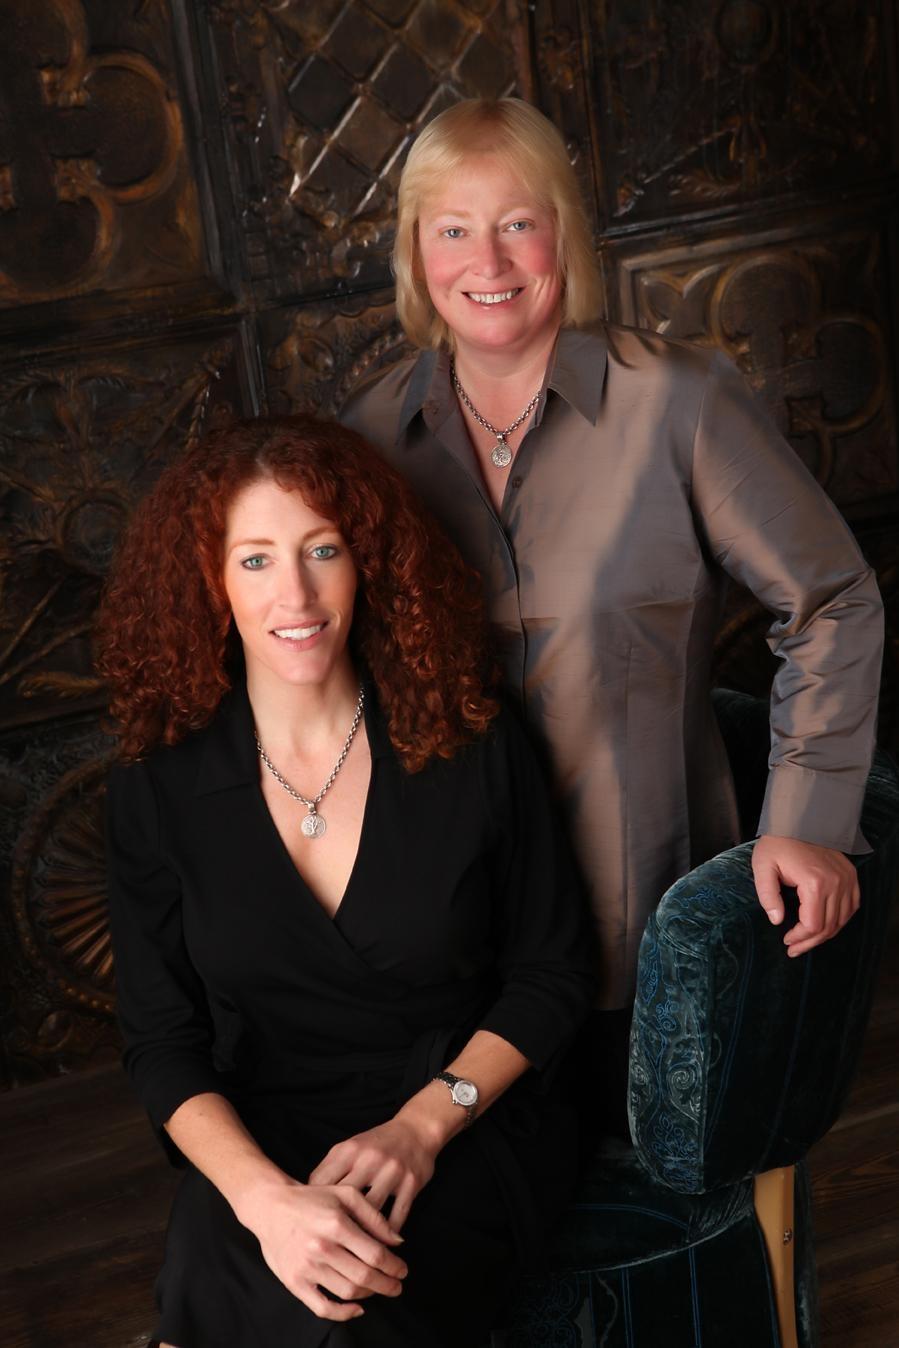 Carter & Putnam, LLC - Lees Summit, MO -